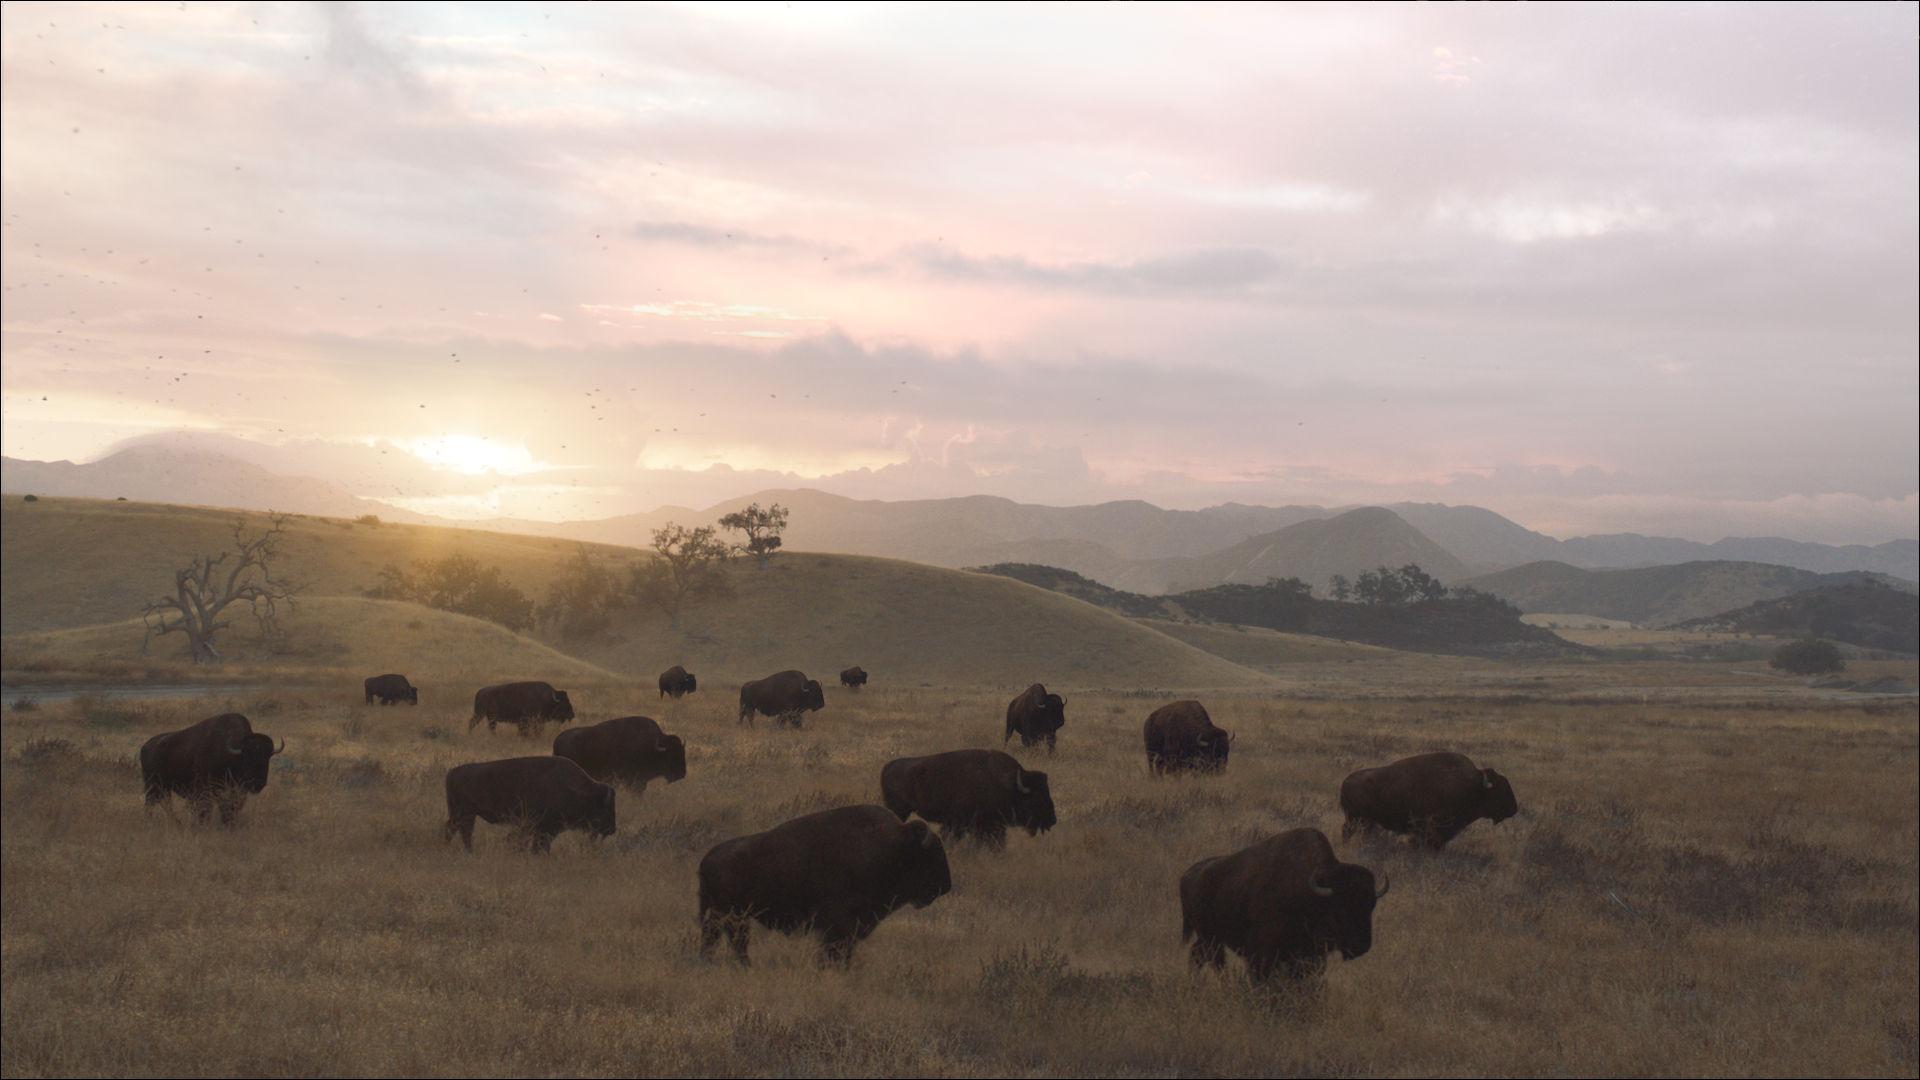 Esurance – Buffalo Roam